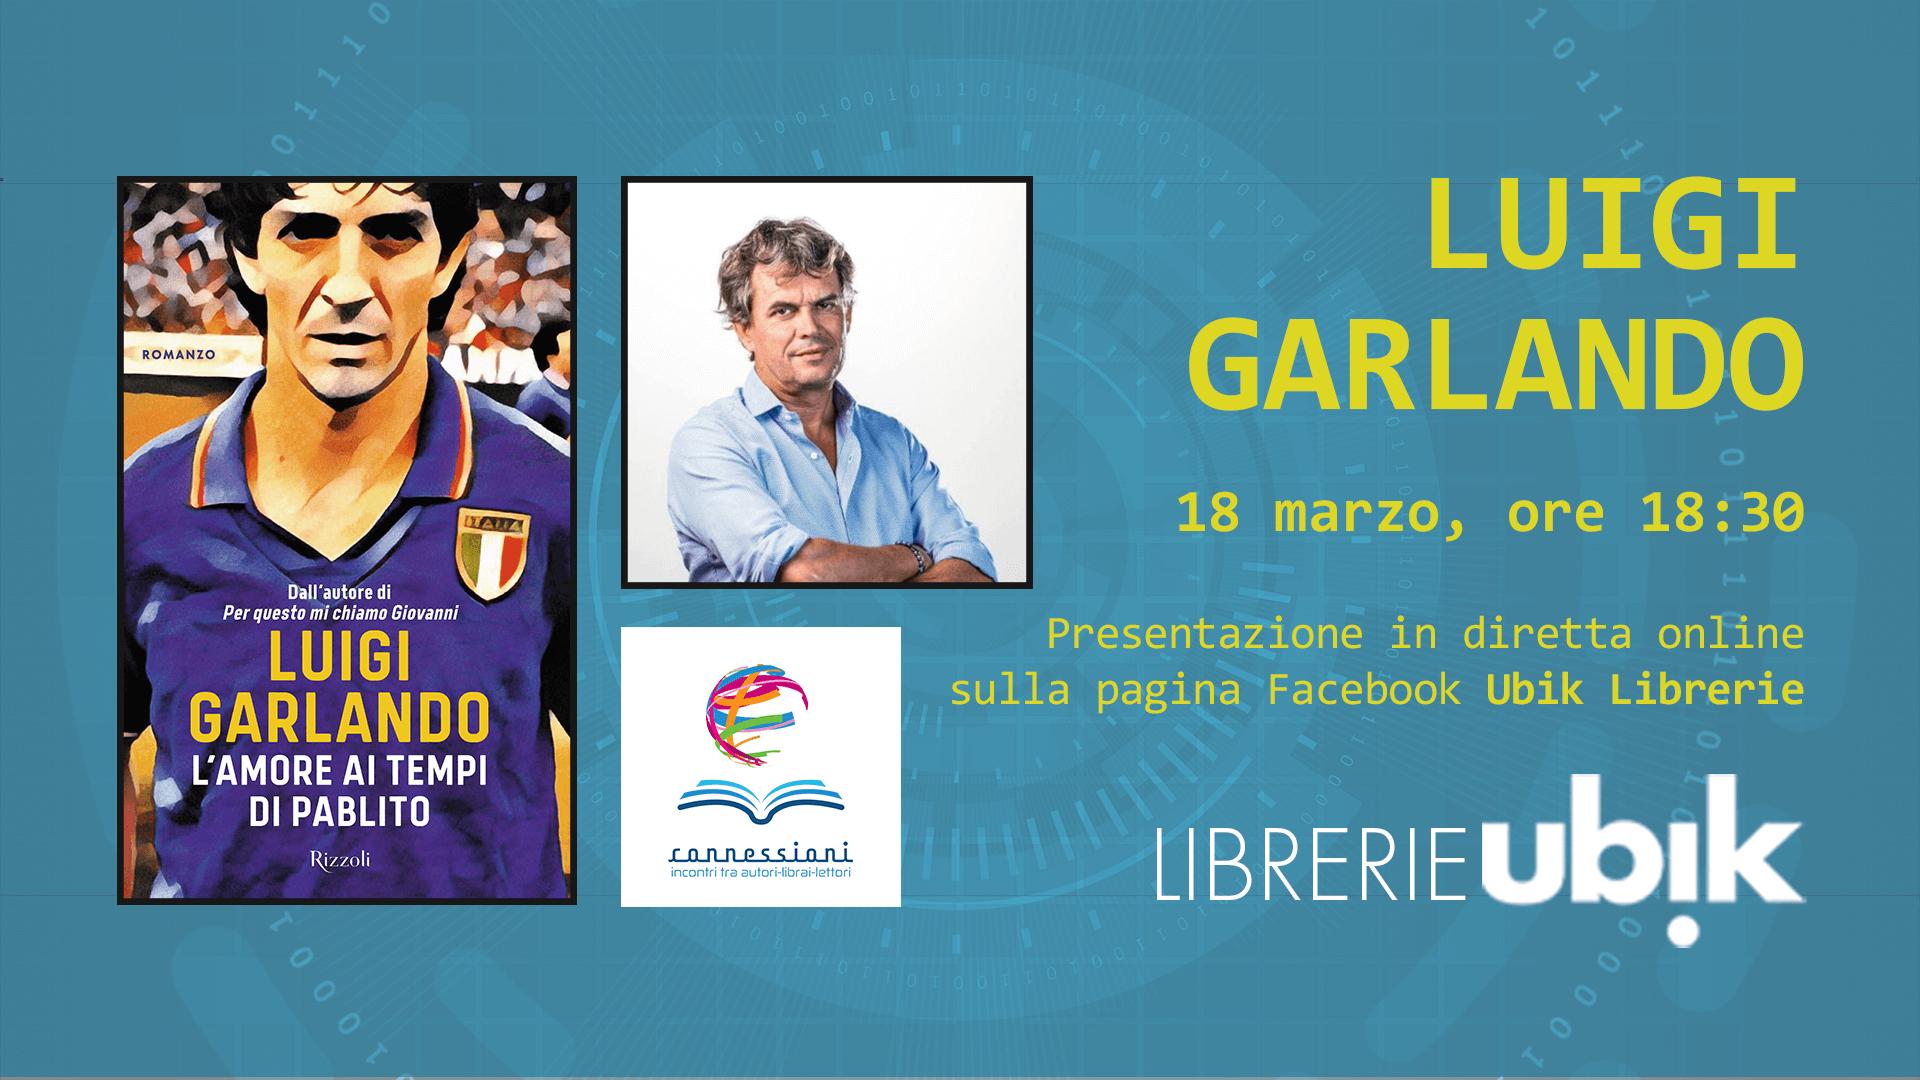 LUIGI GARLANDO presenta in diretta online